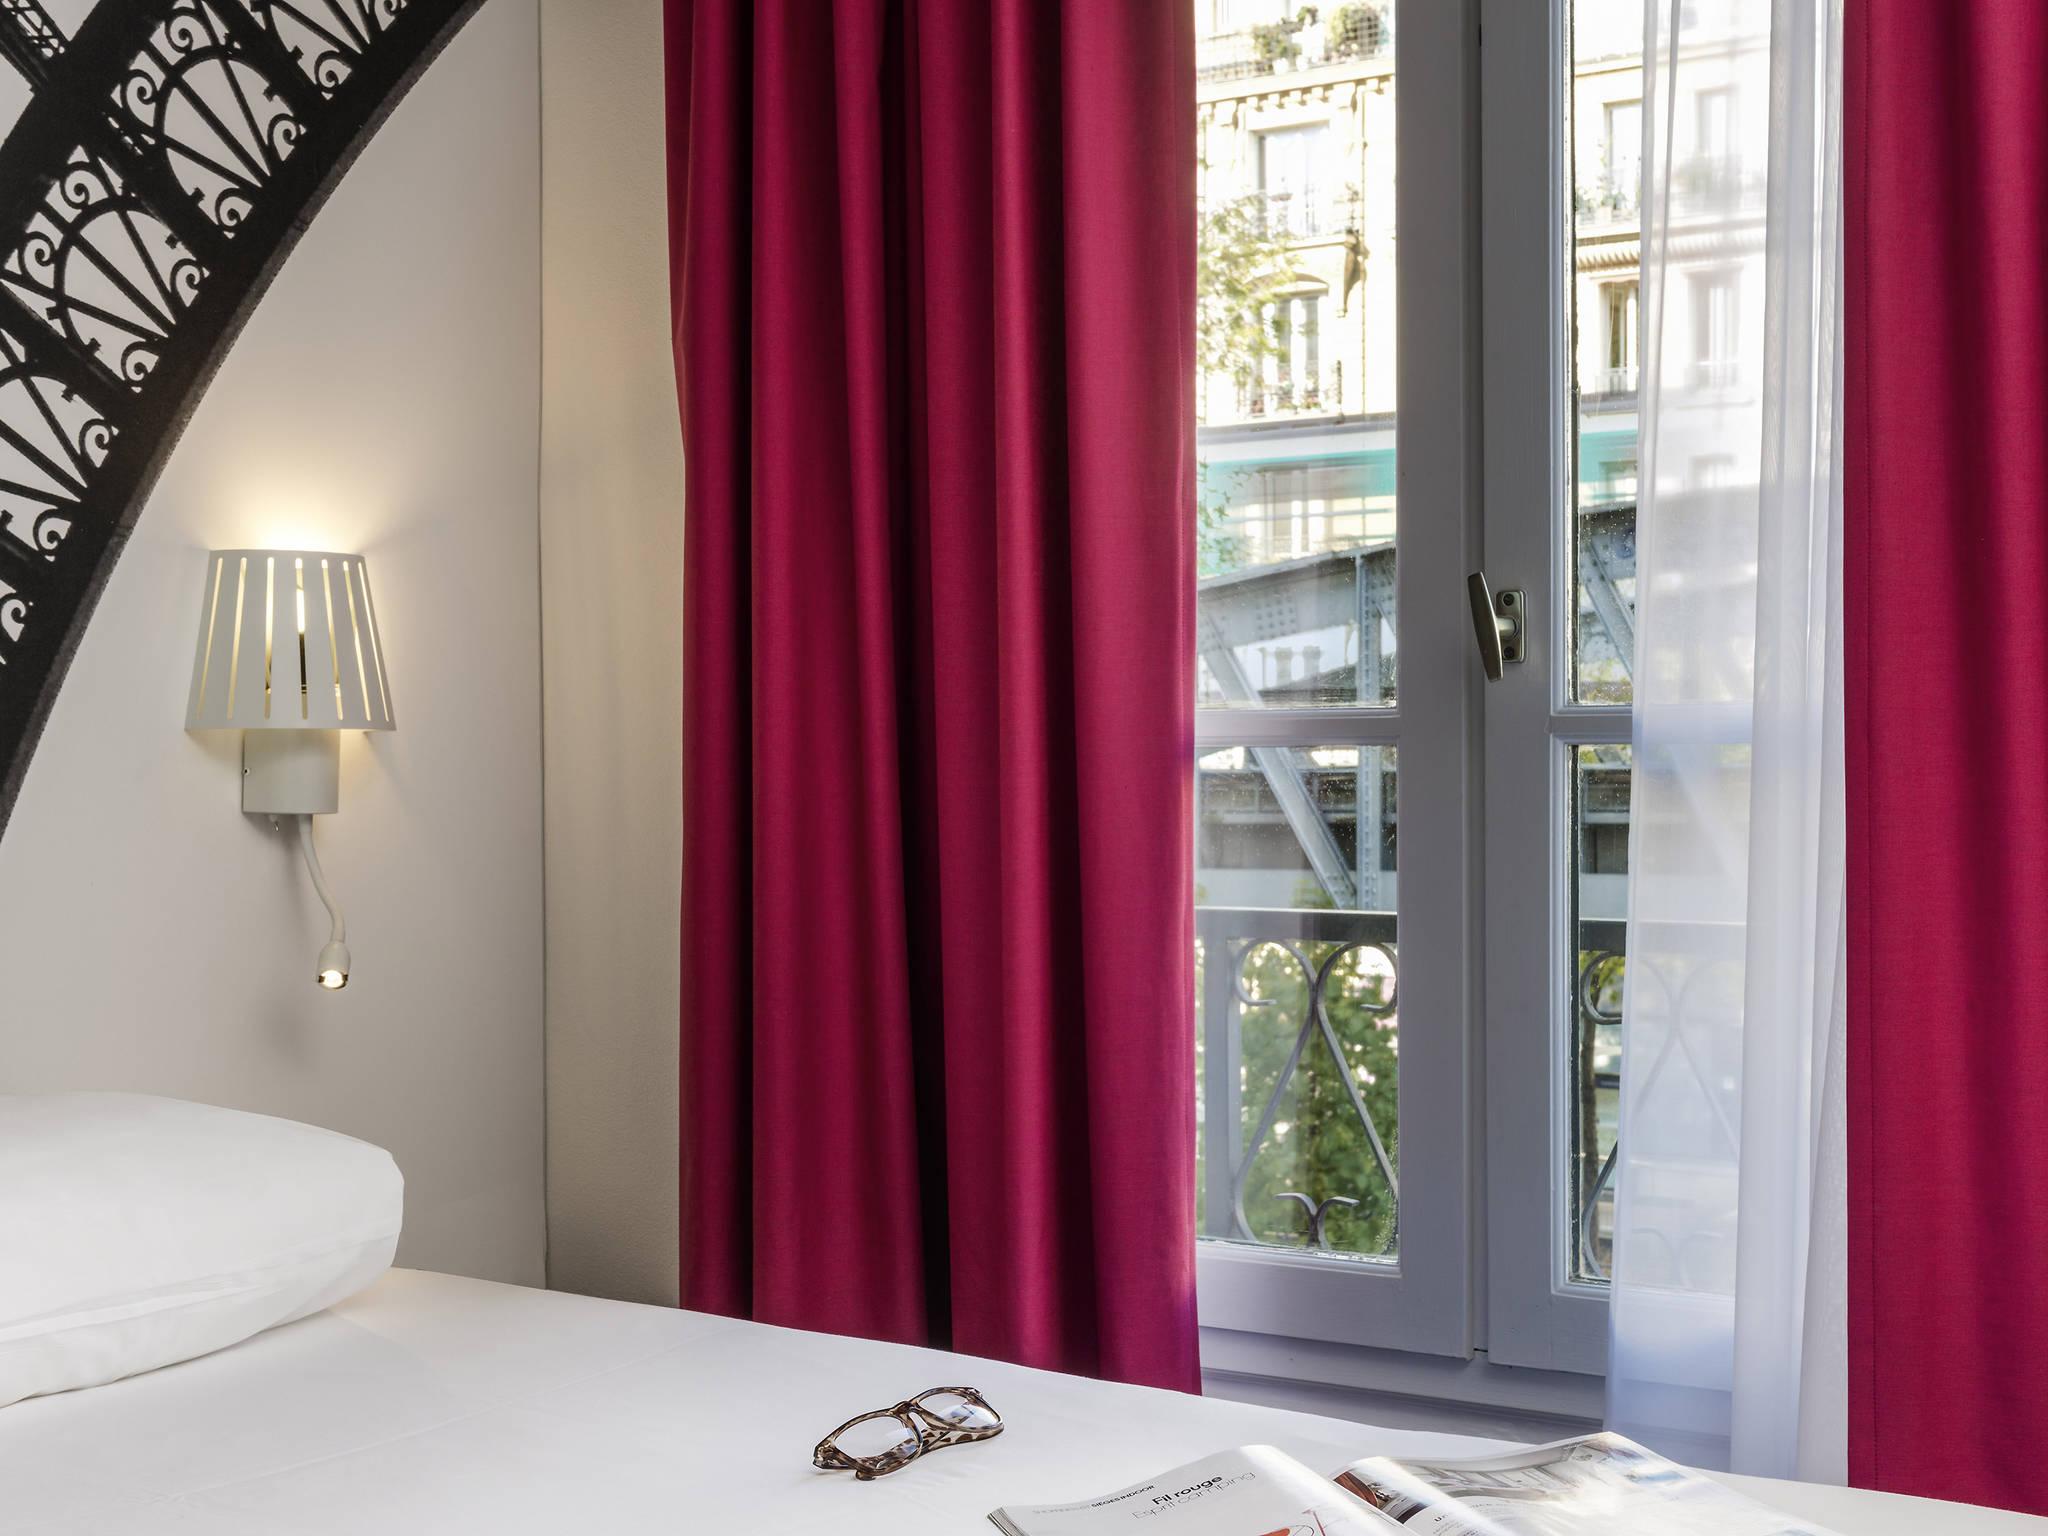 فندق - ibis Styles باريس إيفل كامبرون